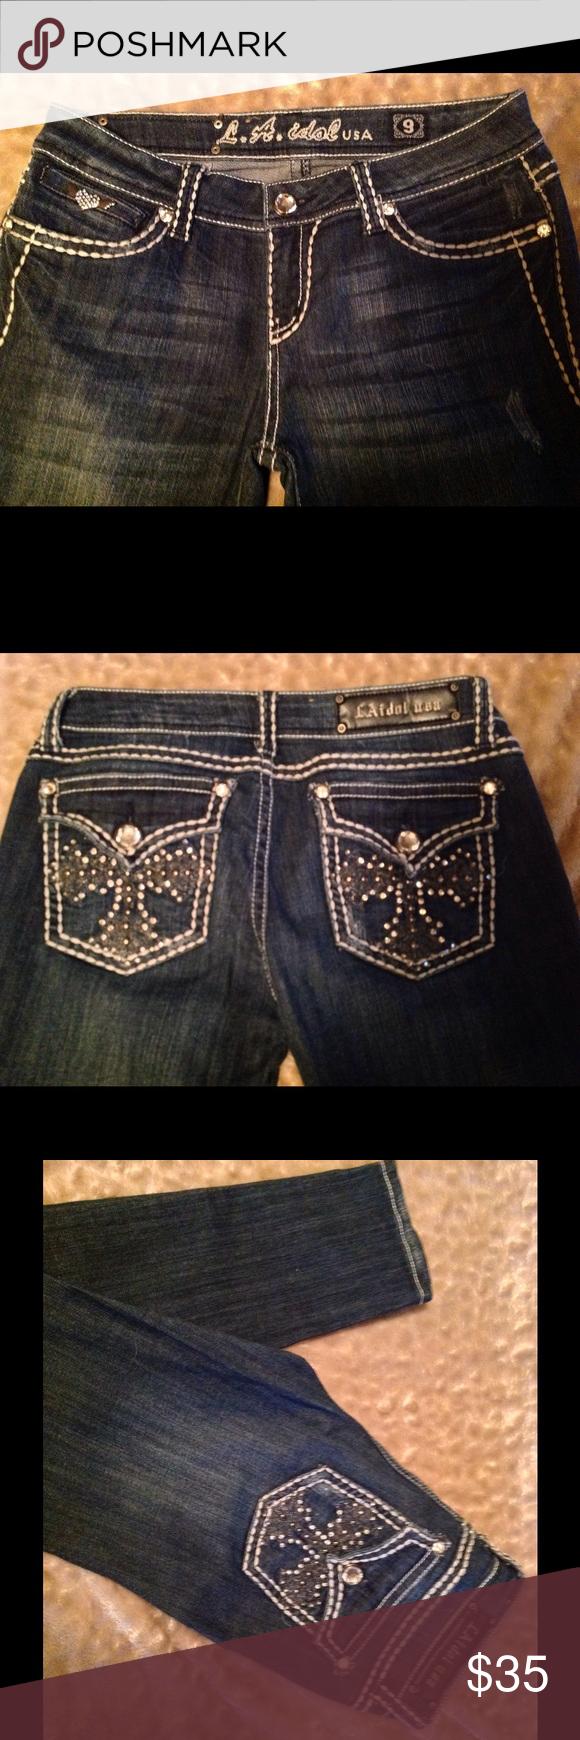 How do you wash bejeweled jeans like miss me or LA Idol?